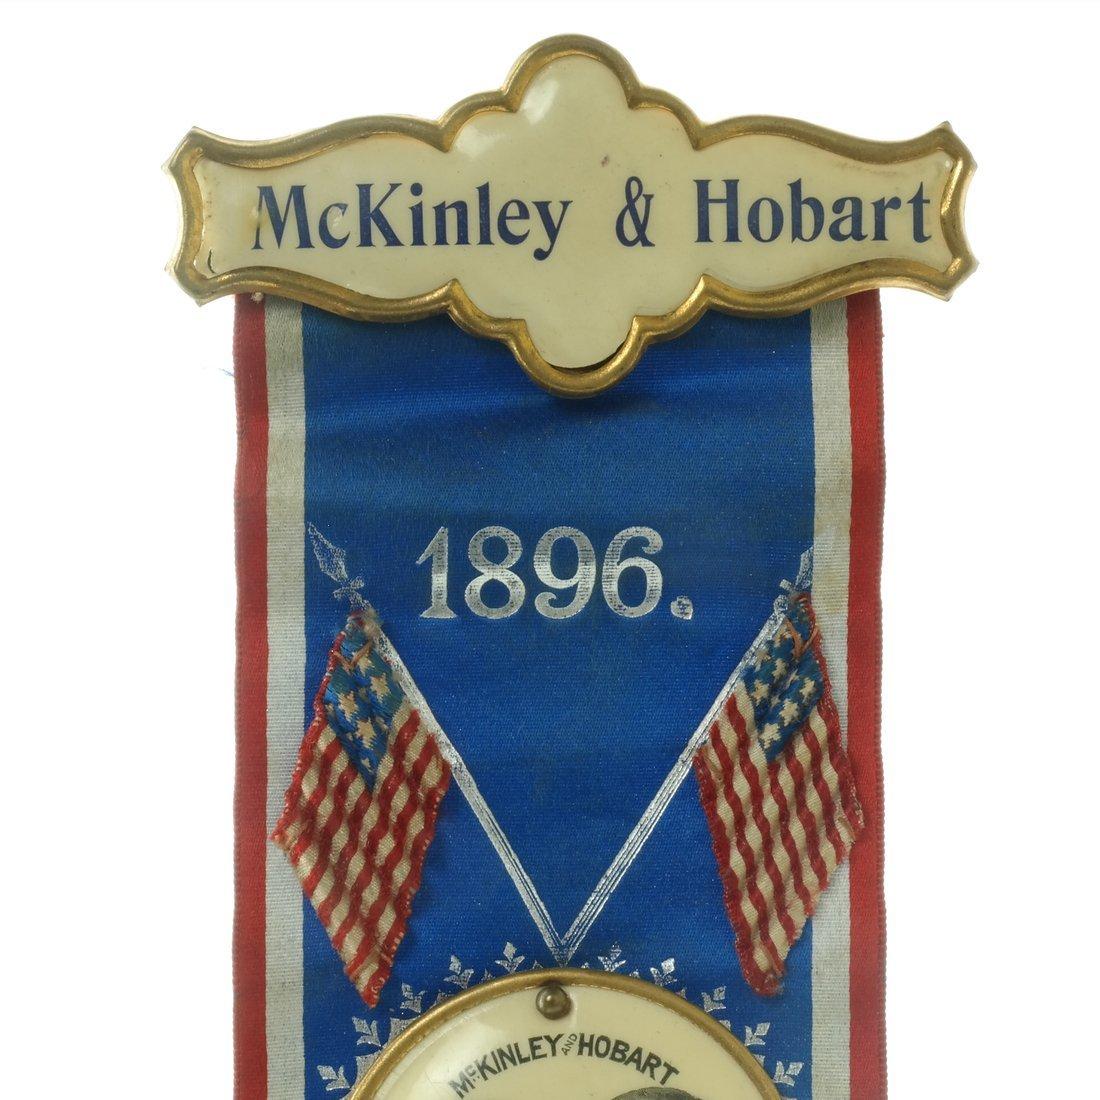 McKinley & Hobart  - Two 1896 Jugate Badges & Ribbons - 5